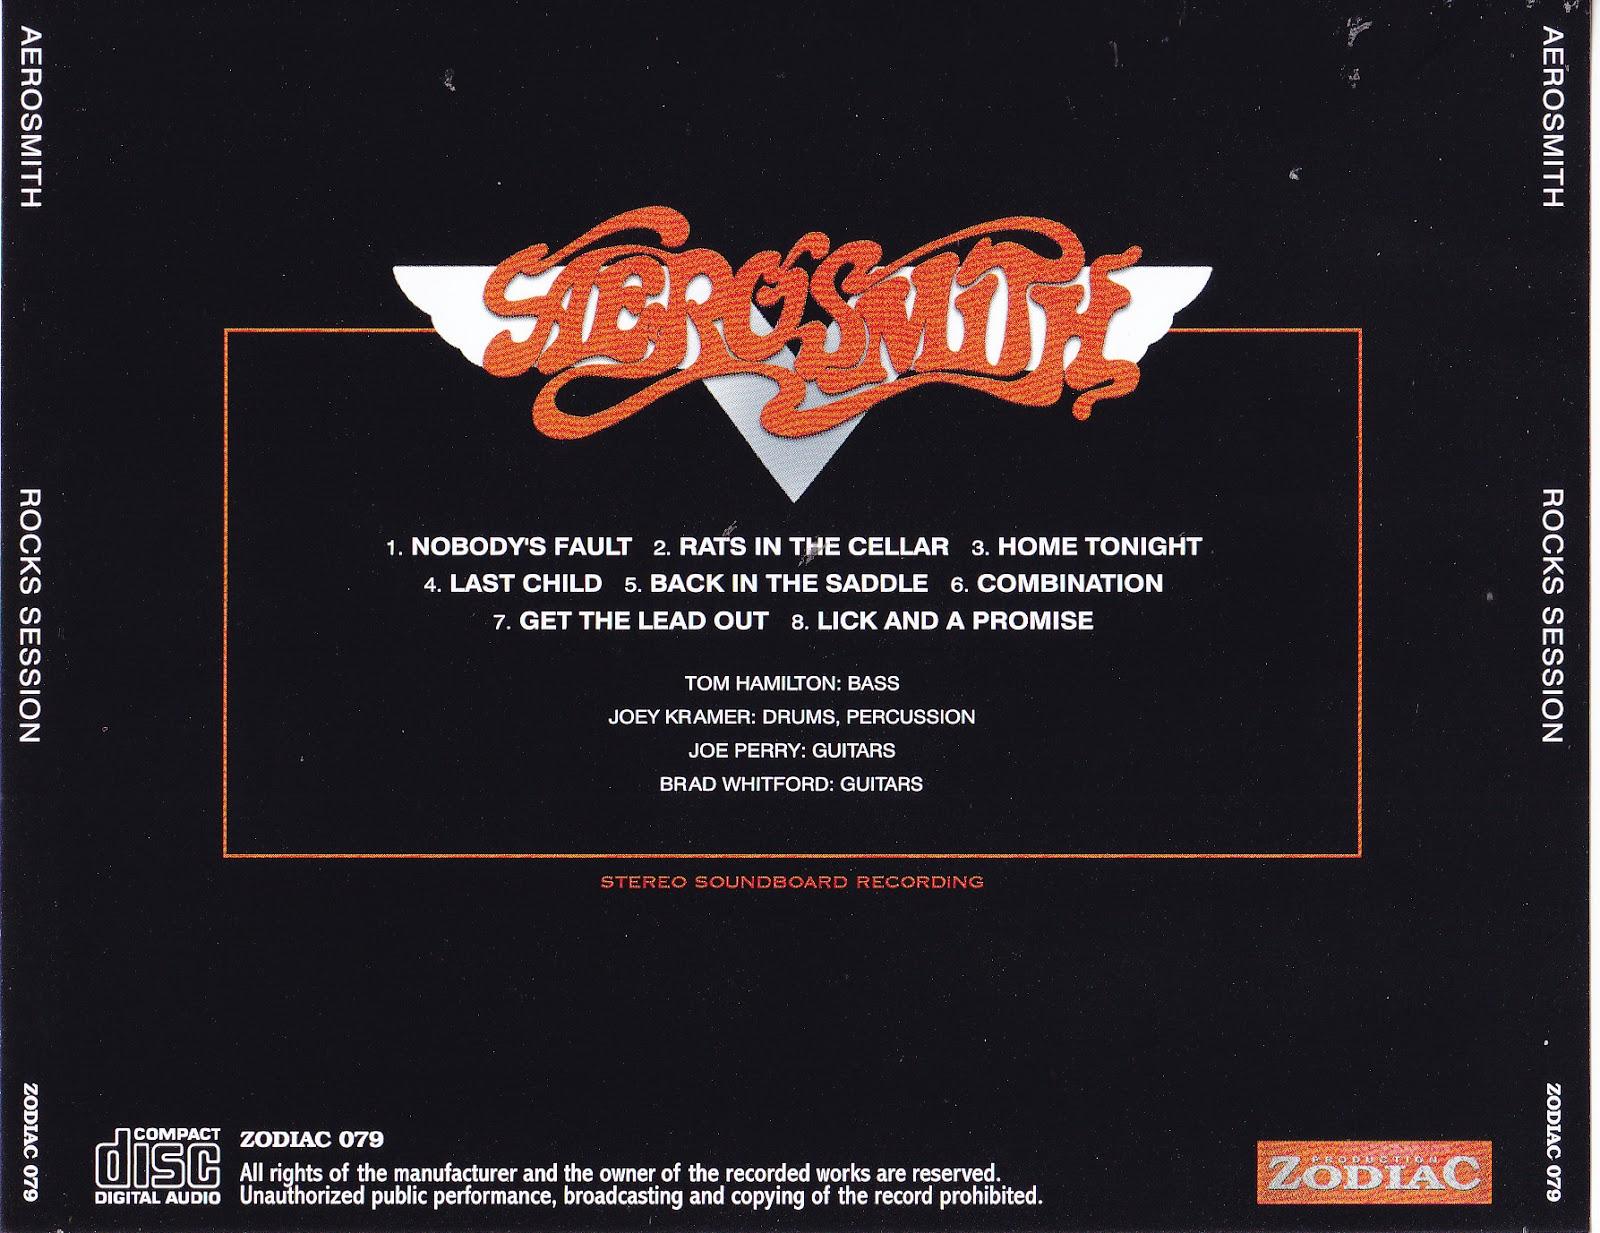 Aerosmith Bootlegs Cover Arts Rocks Session 1976